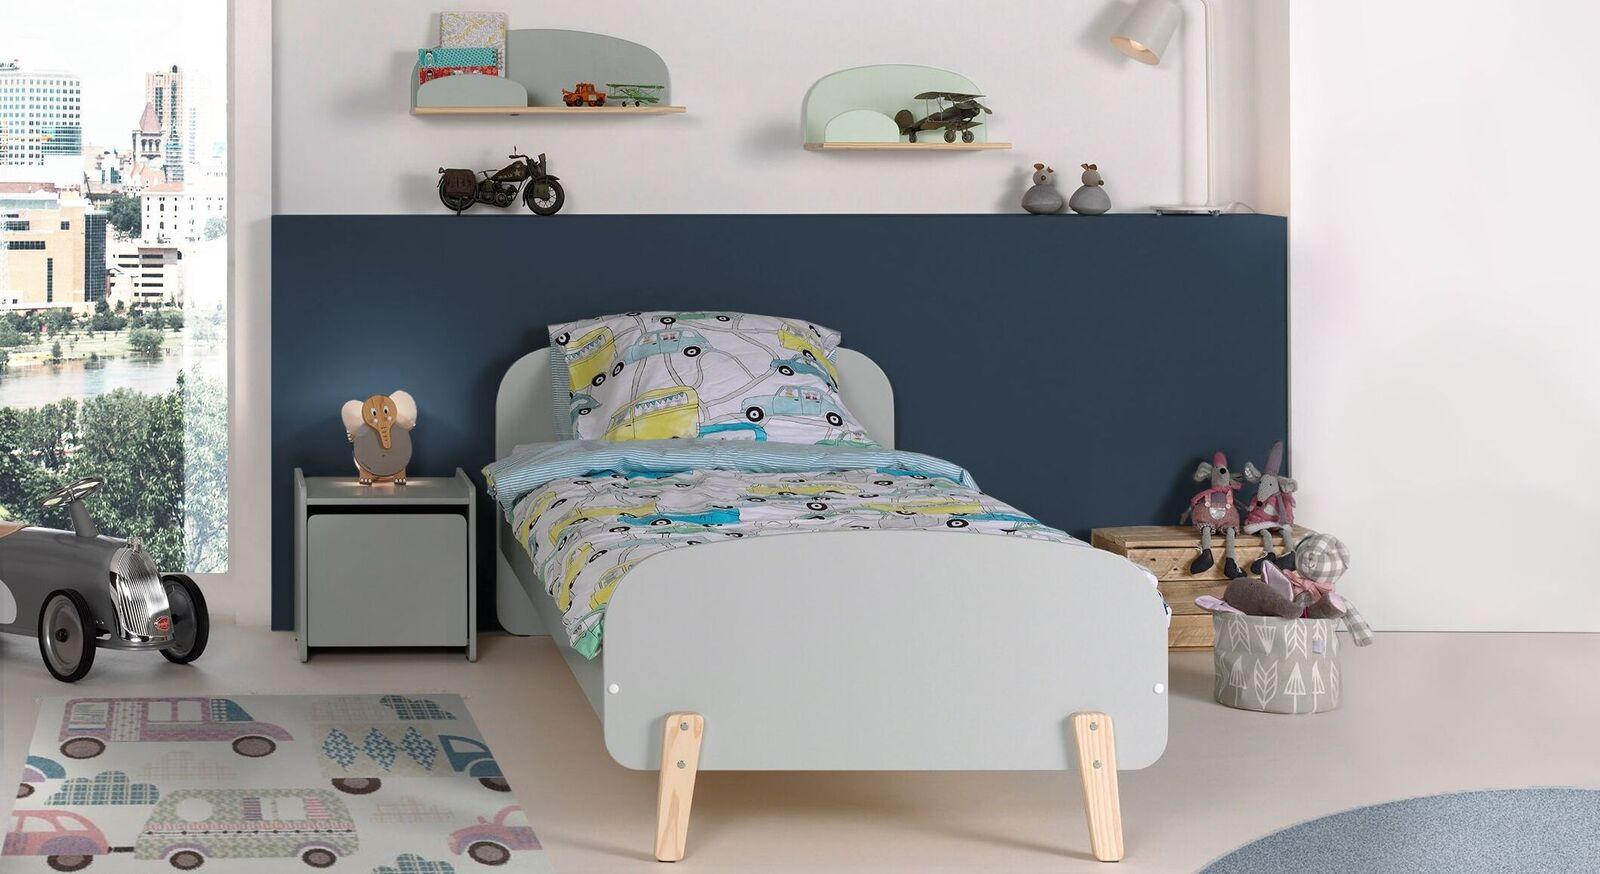 Passende Produkte zum Kinderbett Maila Color